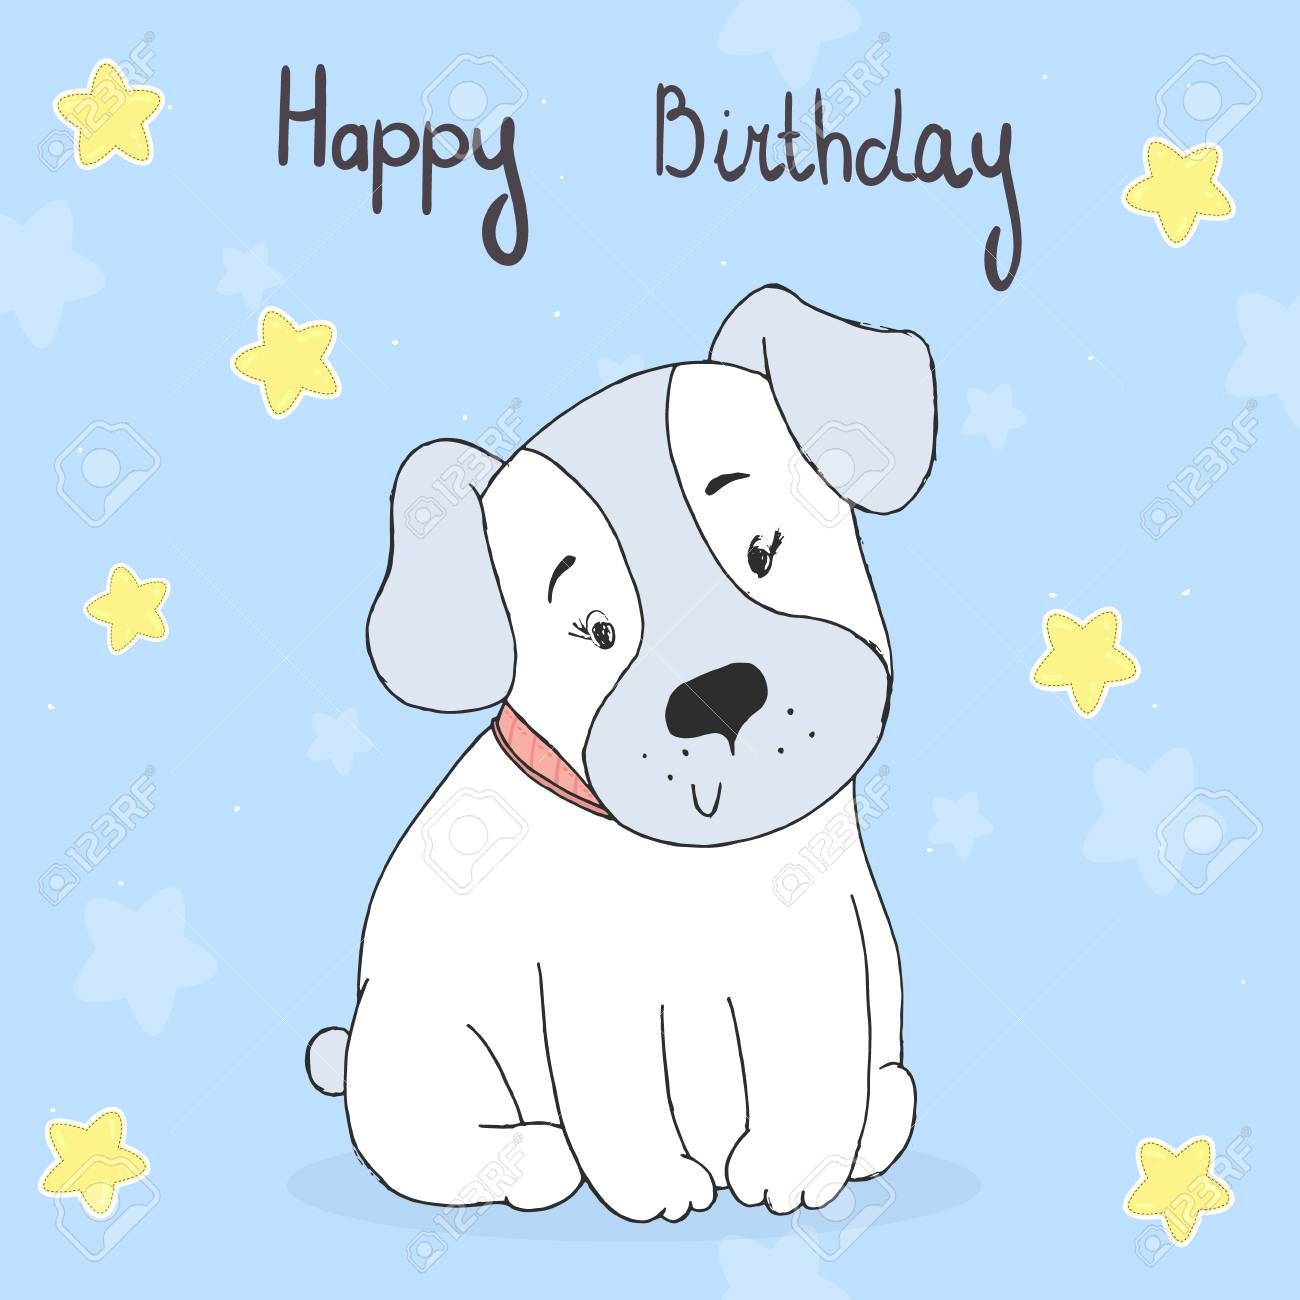 Happy Birthday Card With Hand Drawn Cute Cartoon Dog Vector Illustration Stock